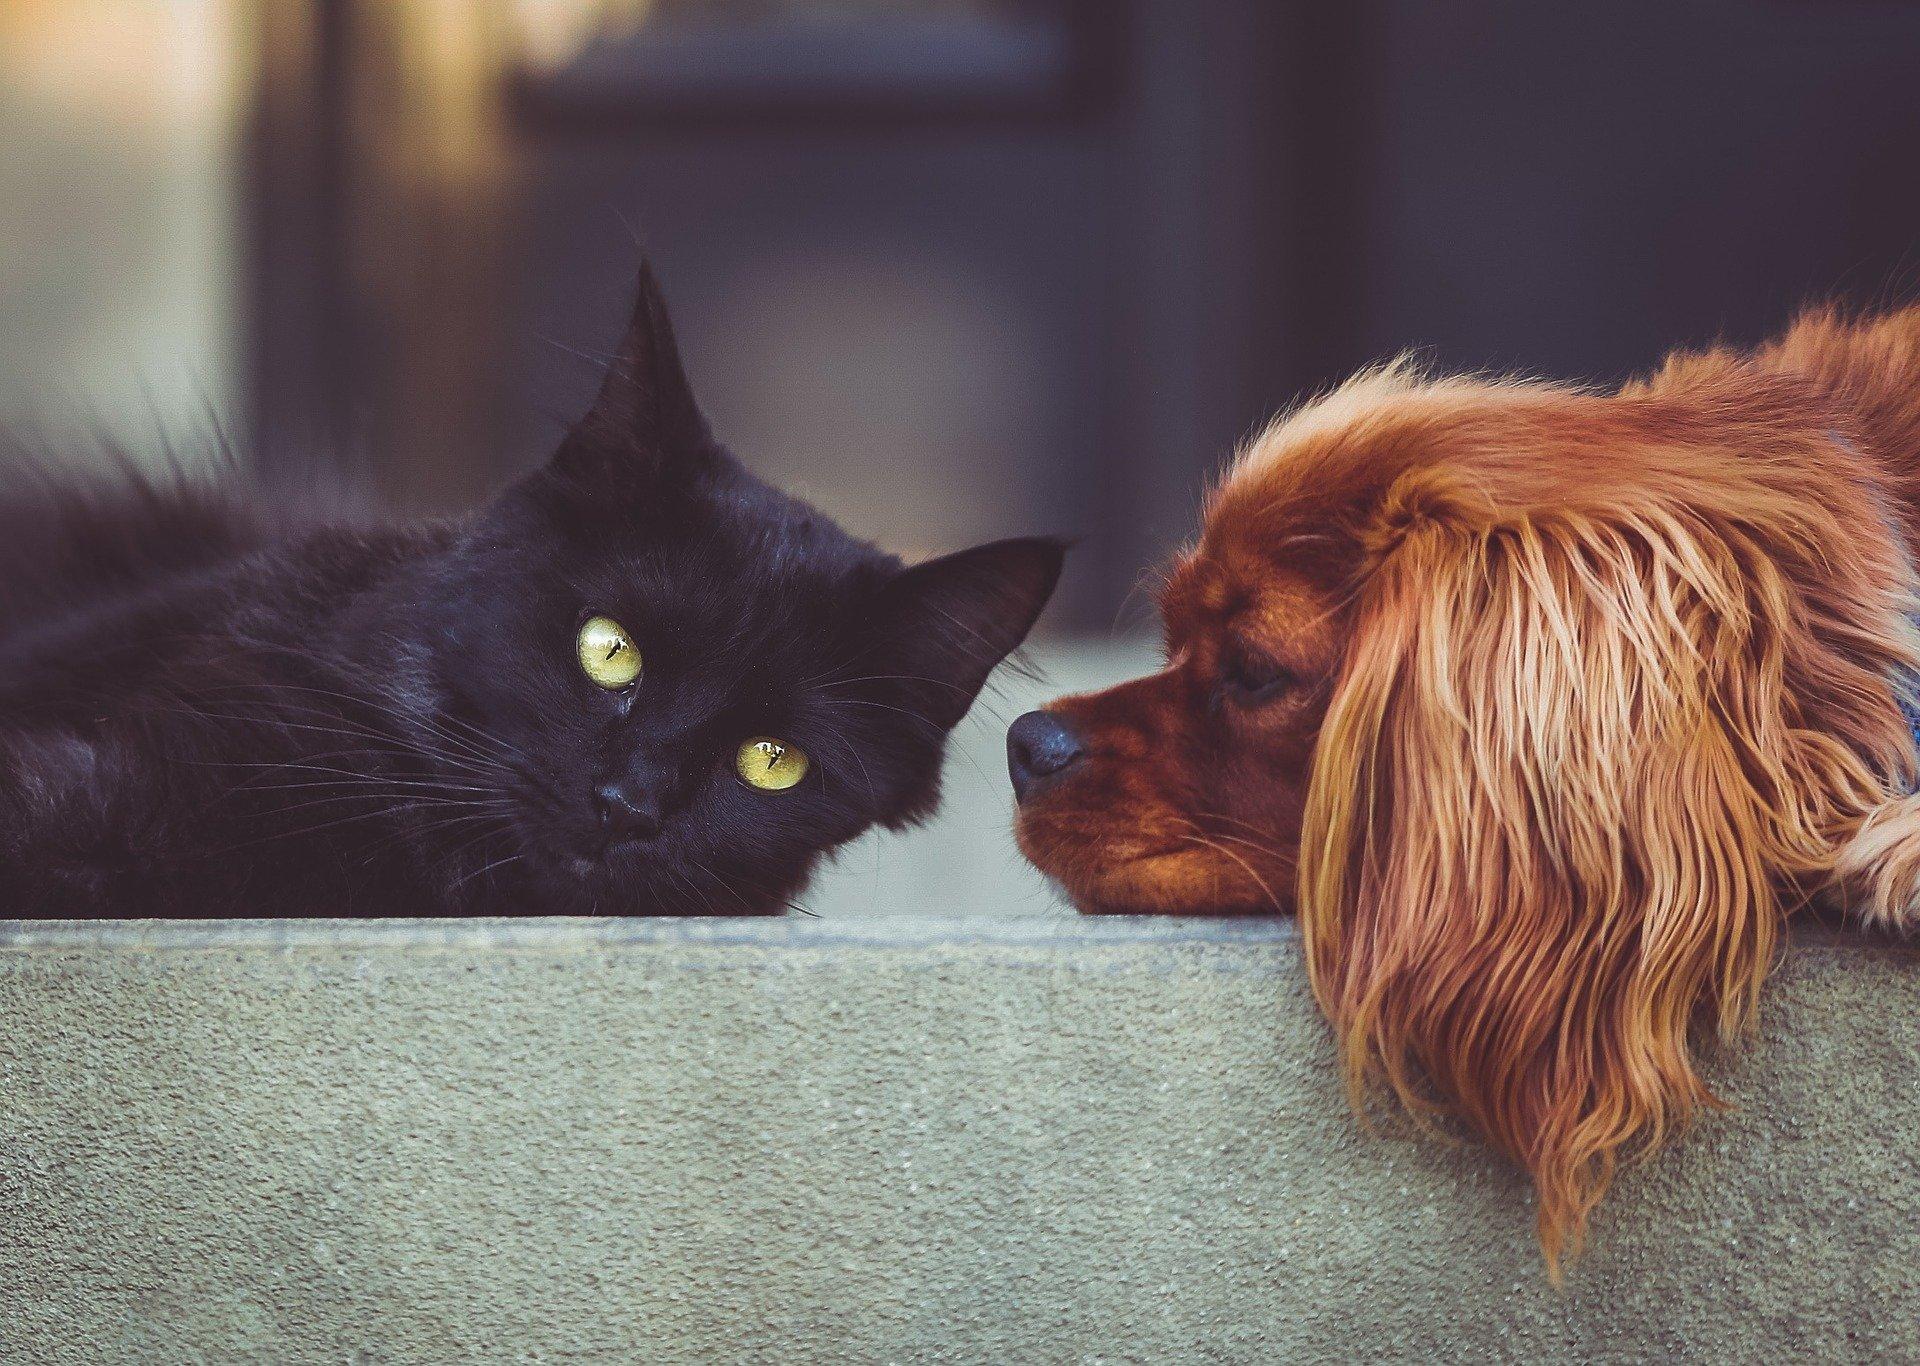 cachorro ciumento olhando gato